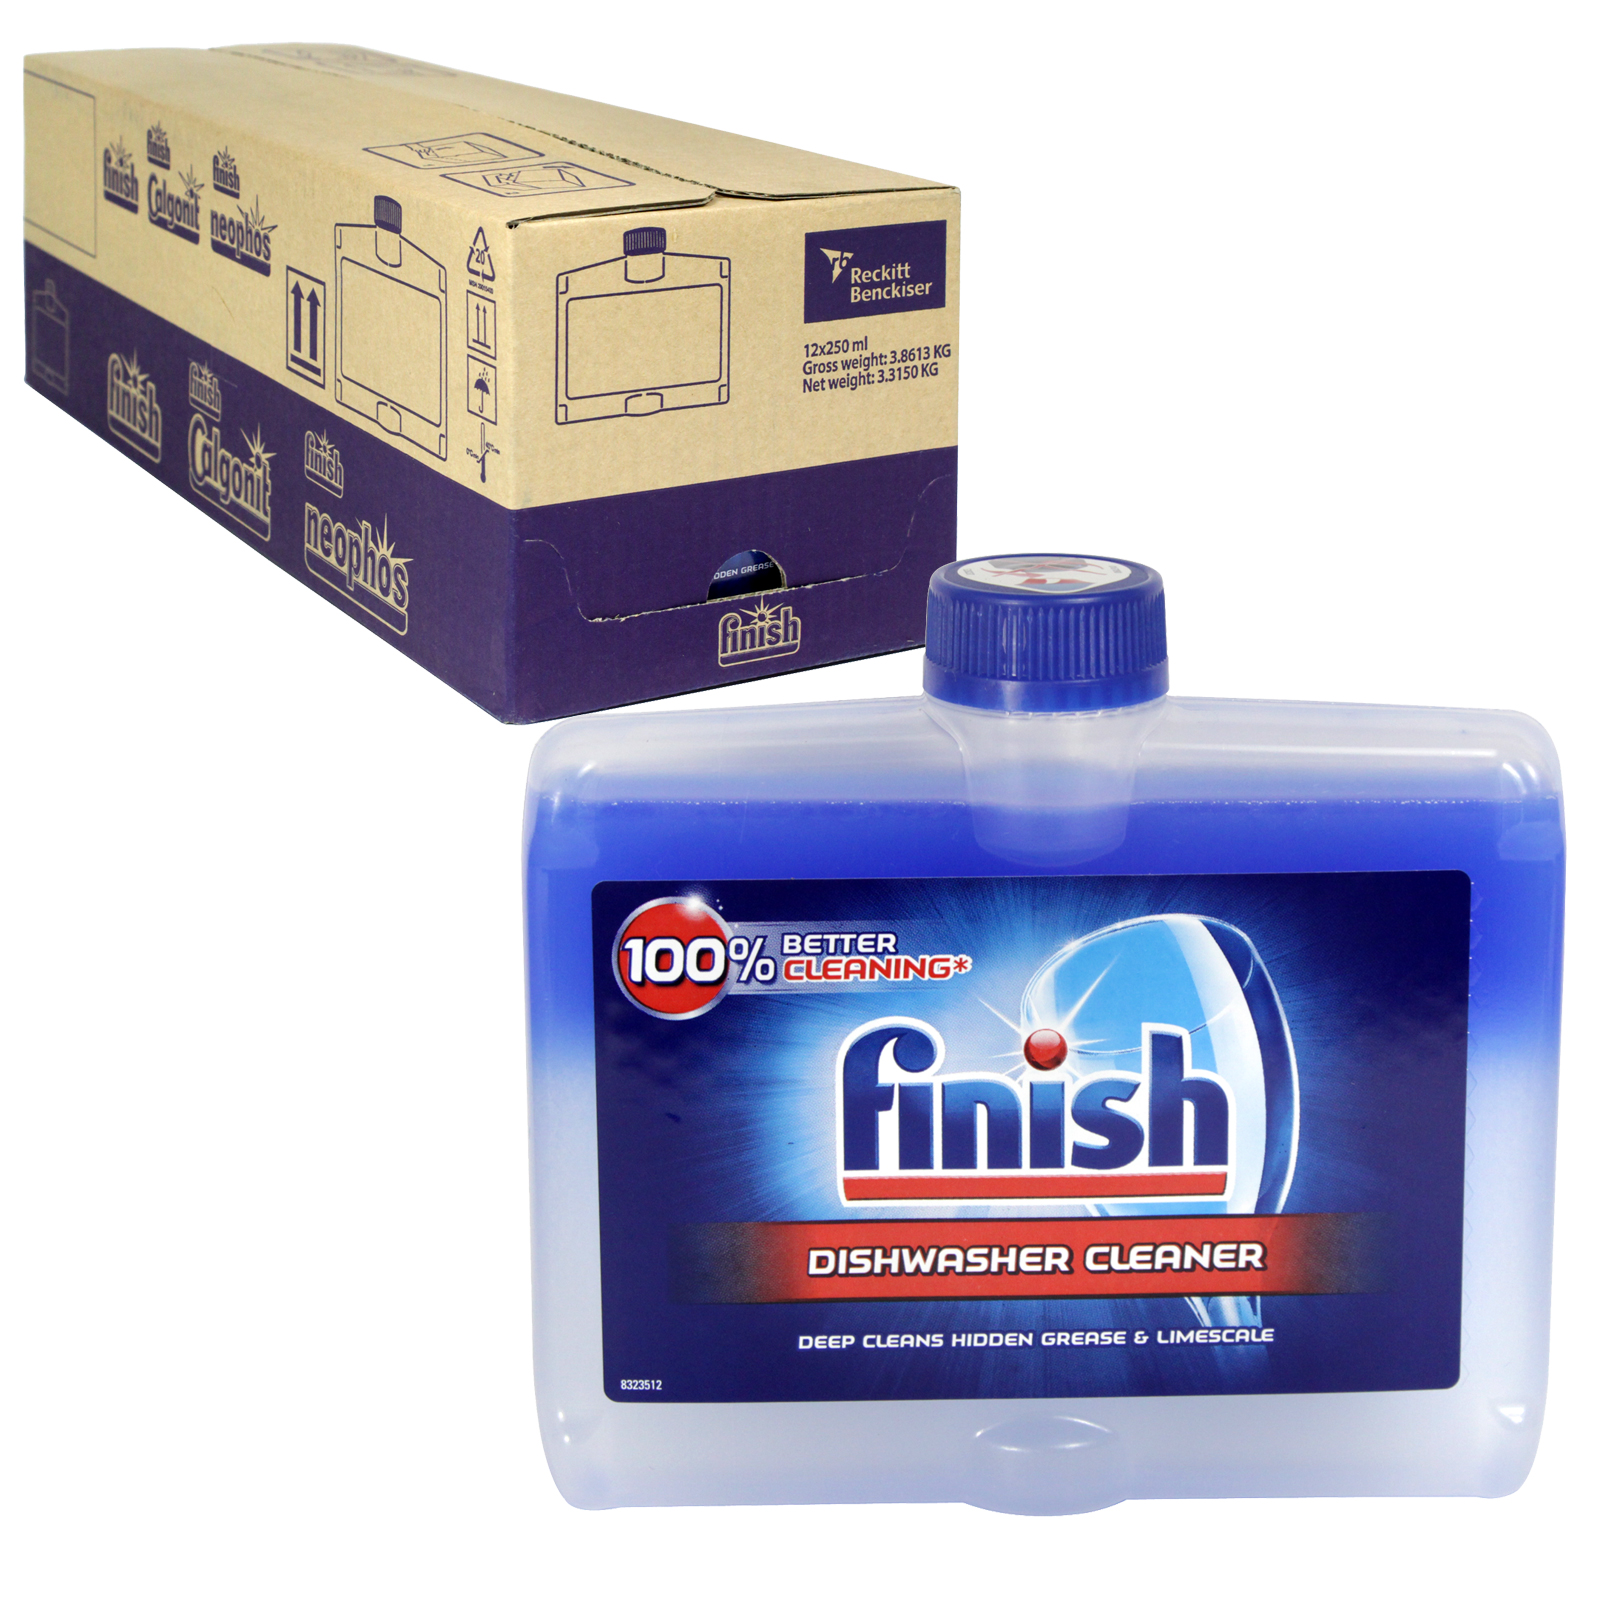 FINISH DISHWASHER CLEANER 250ML REGULAR X12